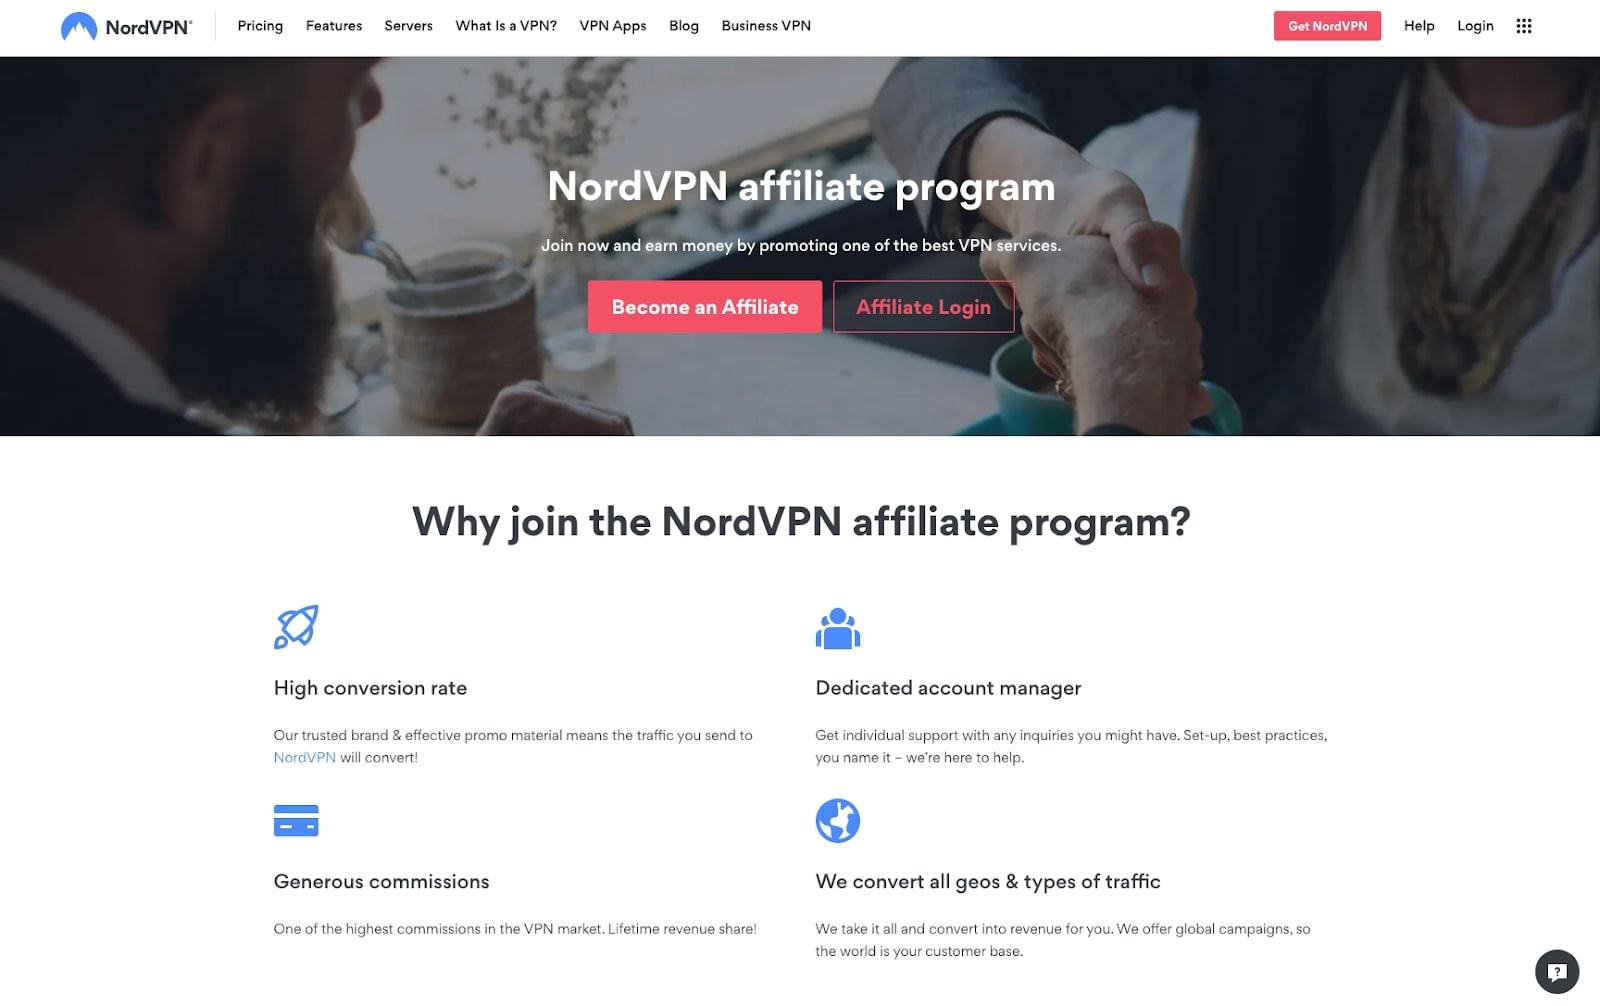 Screenshot of NordVPN affiliate program website